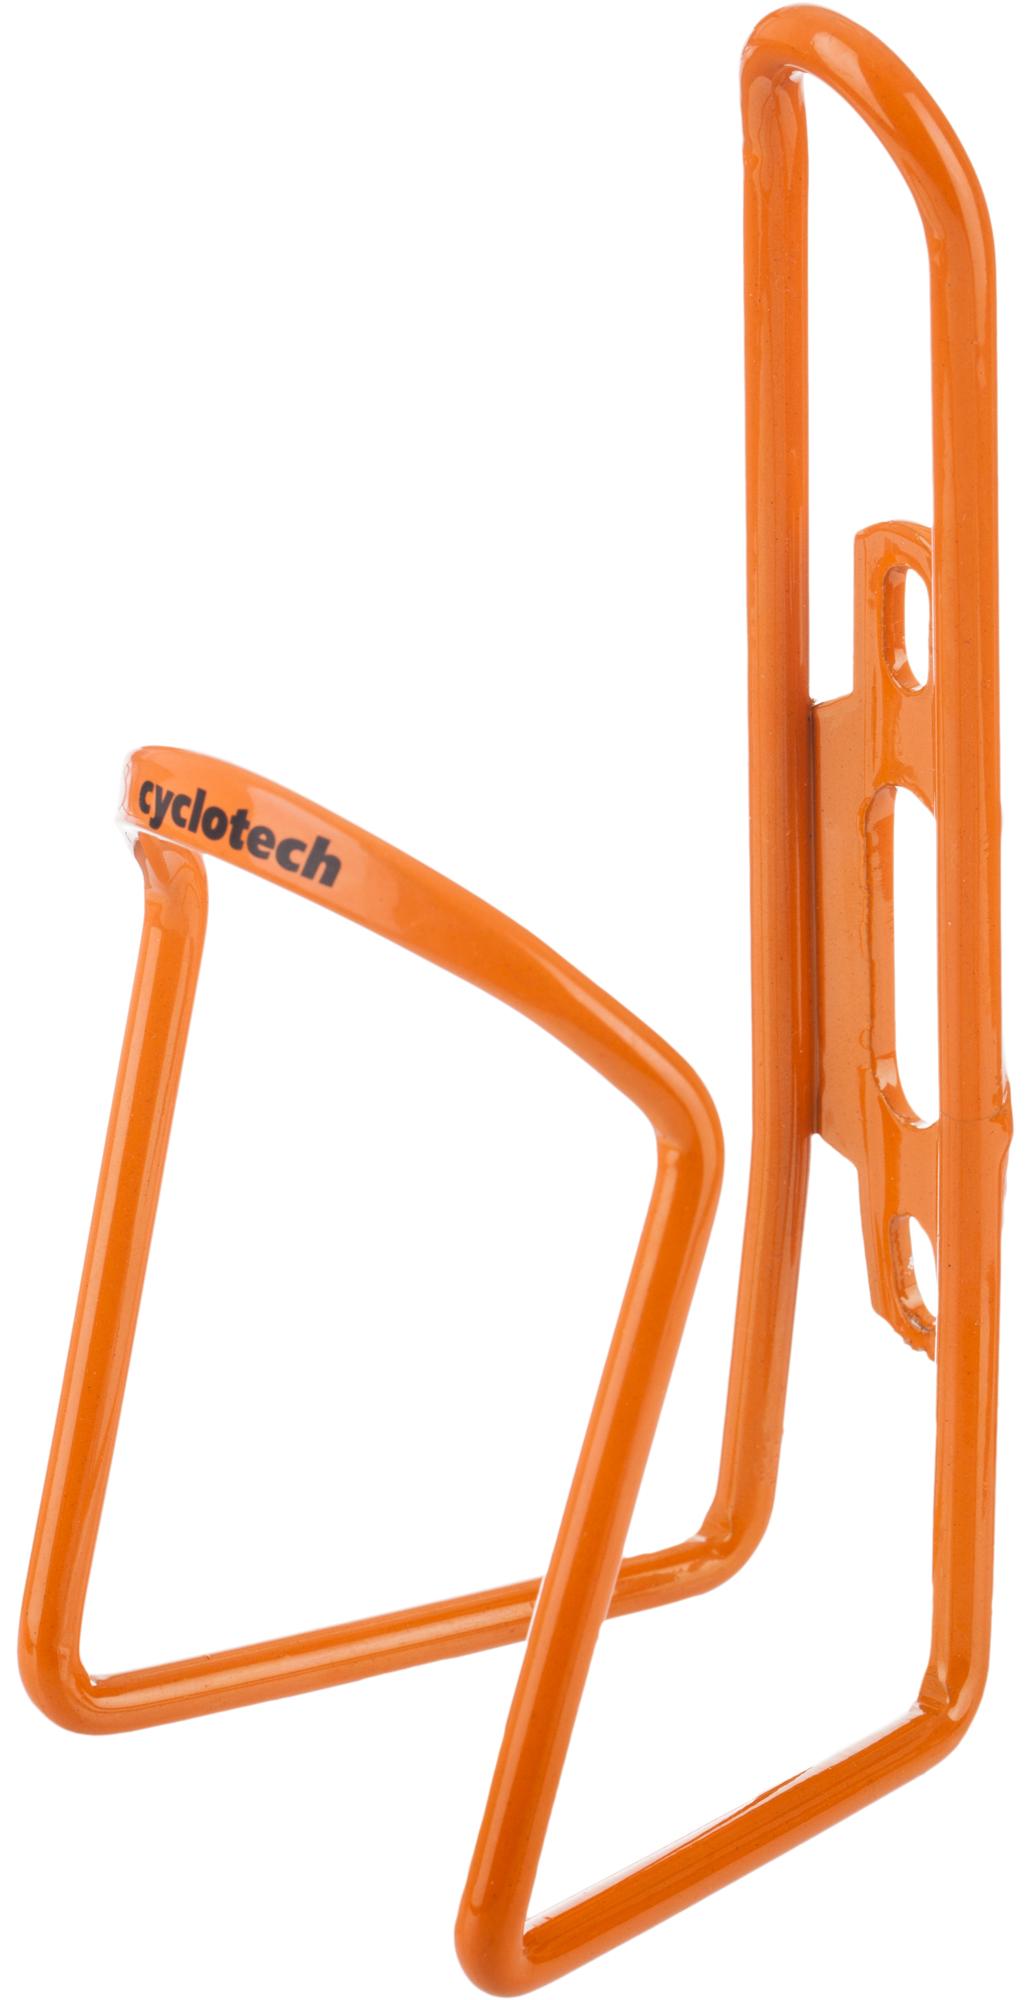 Cyclotech Флягодержатель Cyclotech, размер Без размера